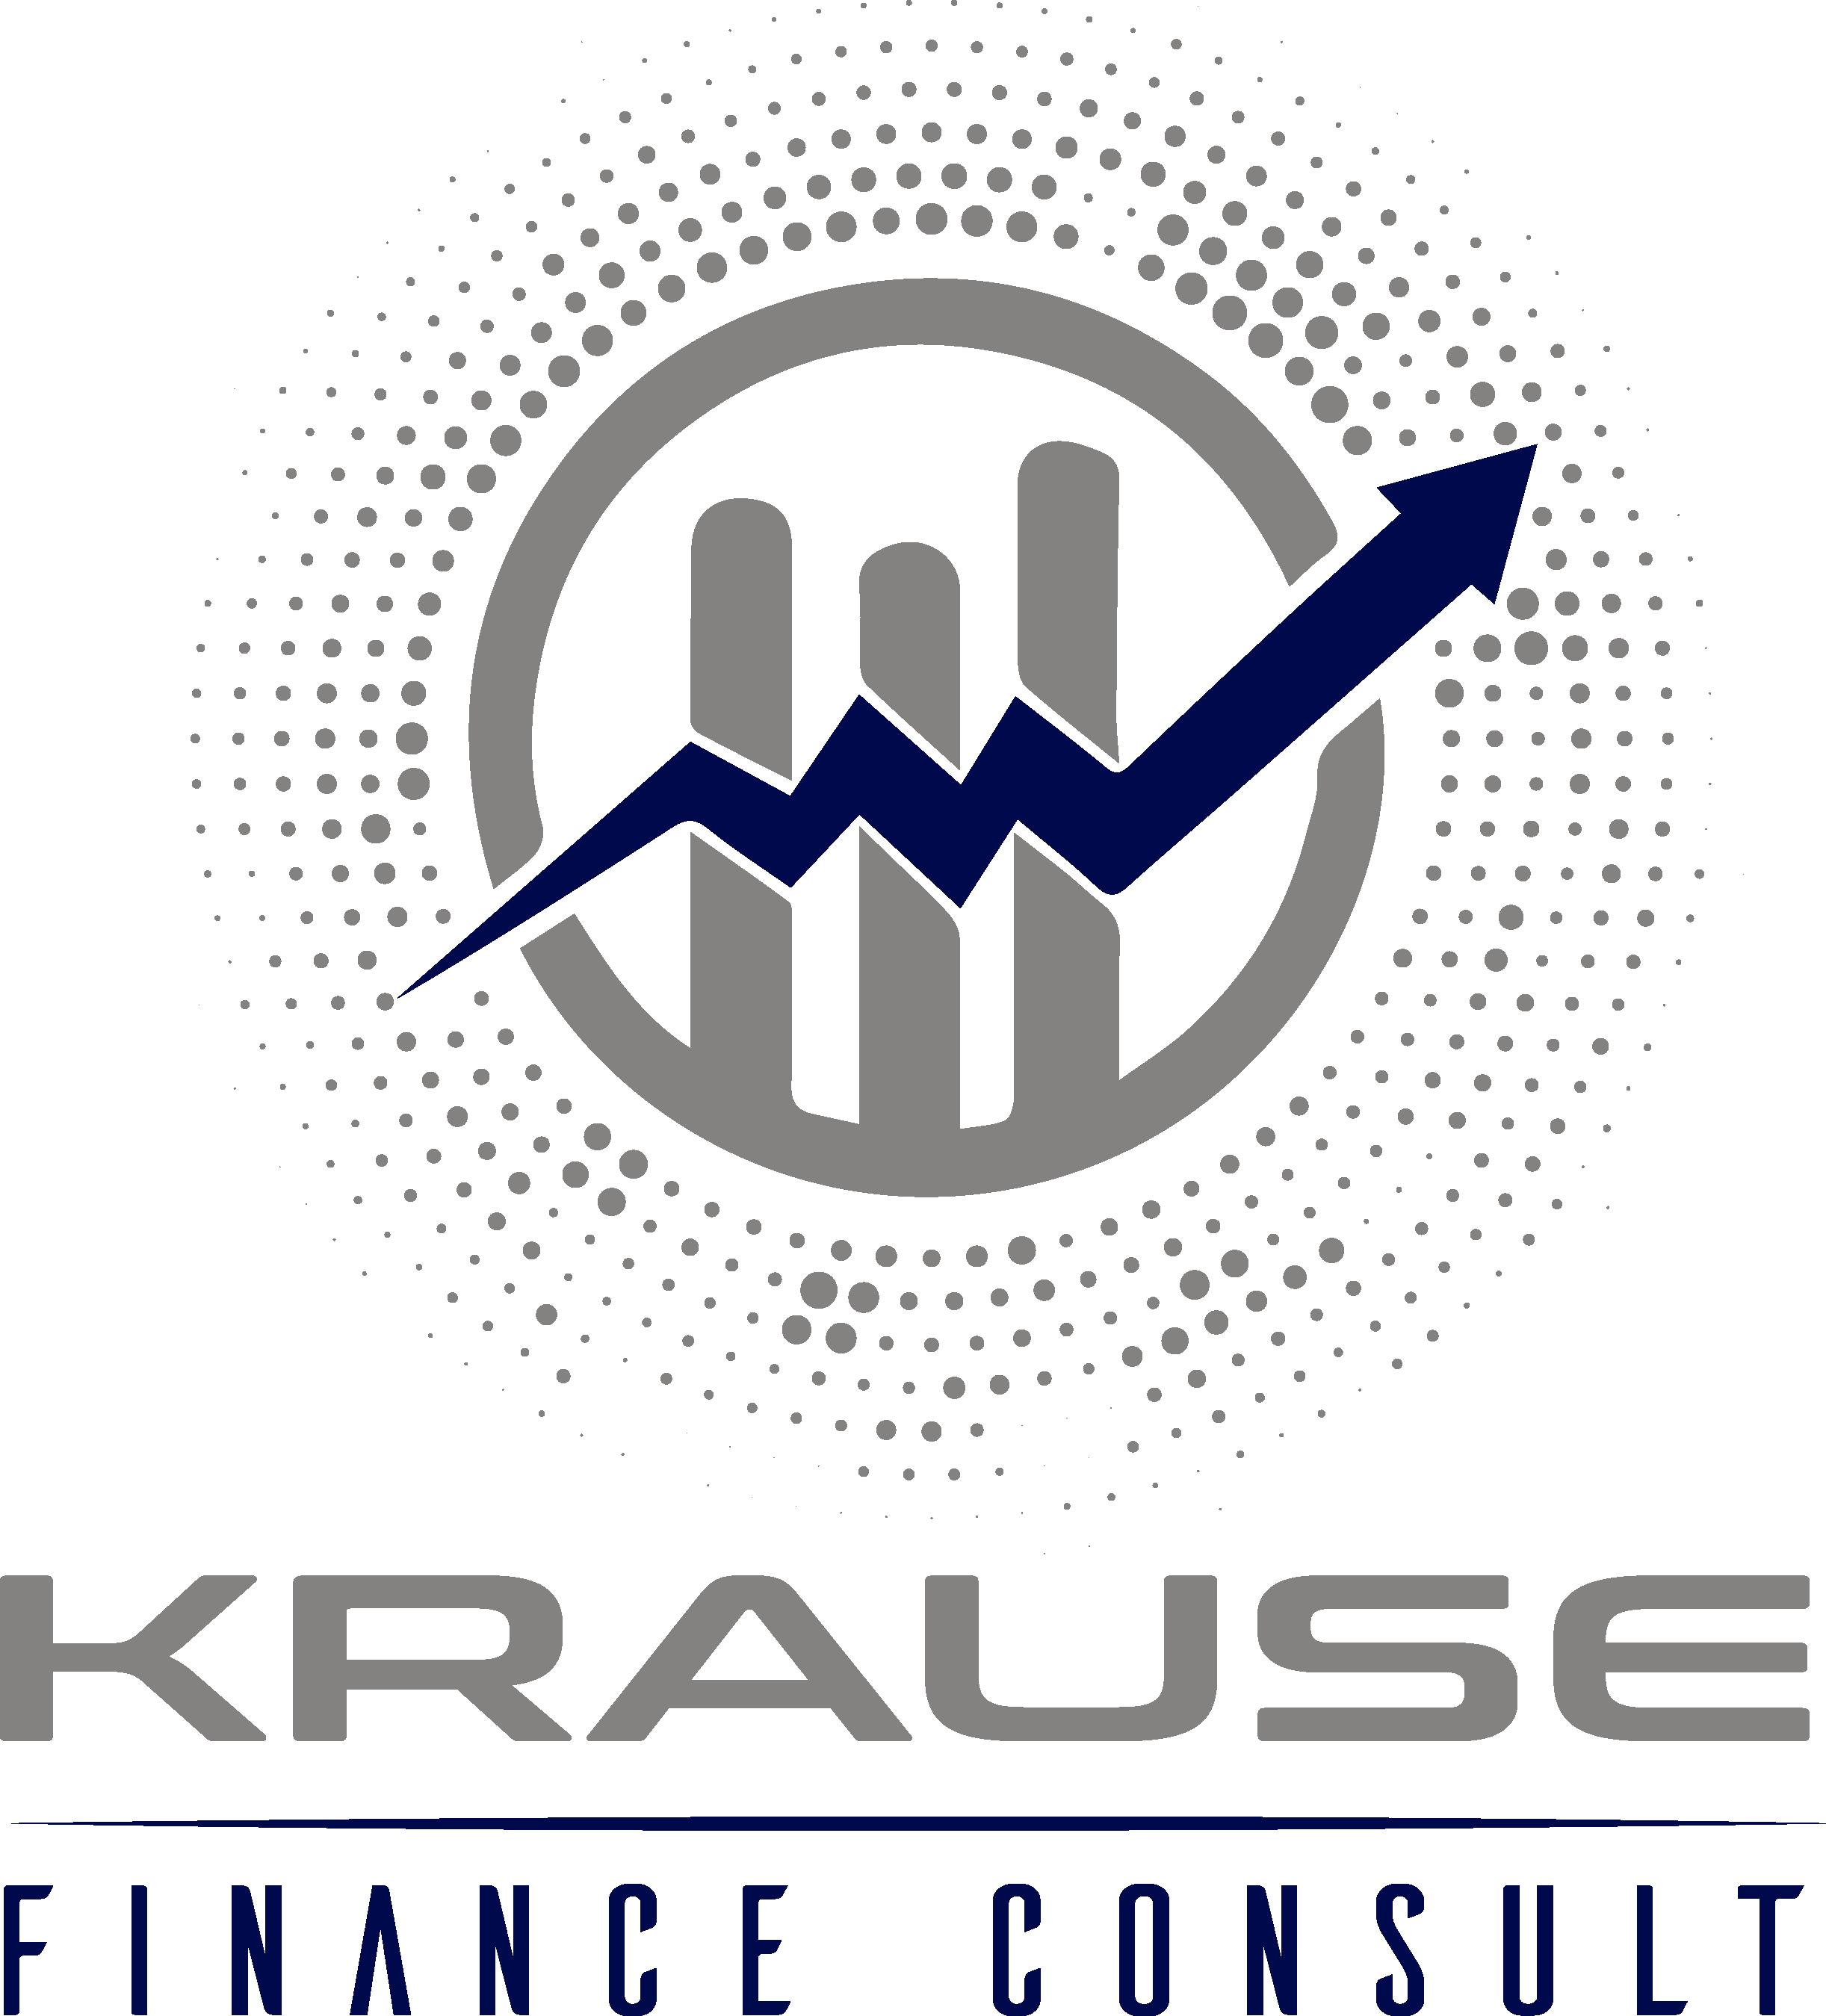 Krause Finance Consult